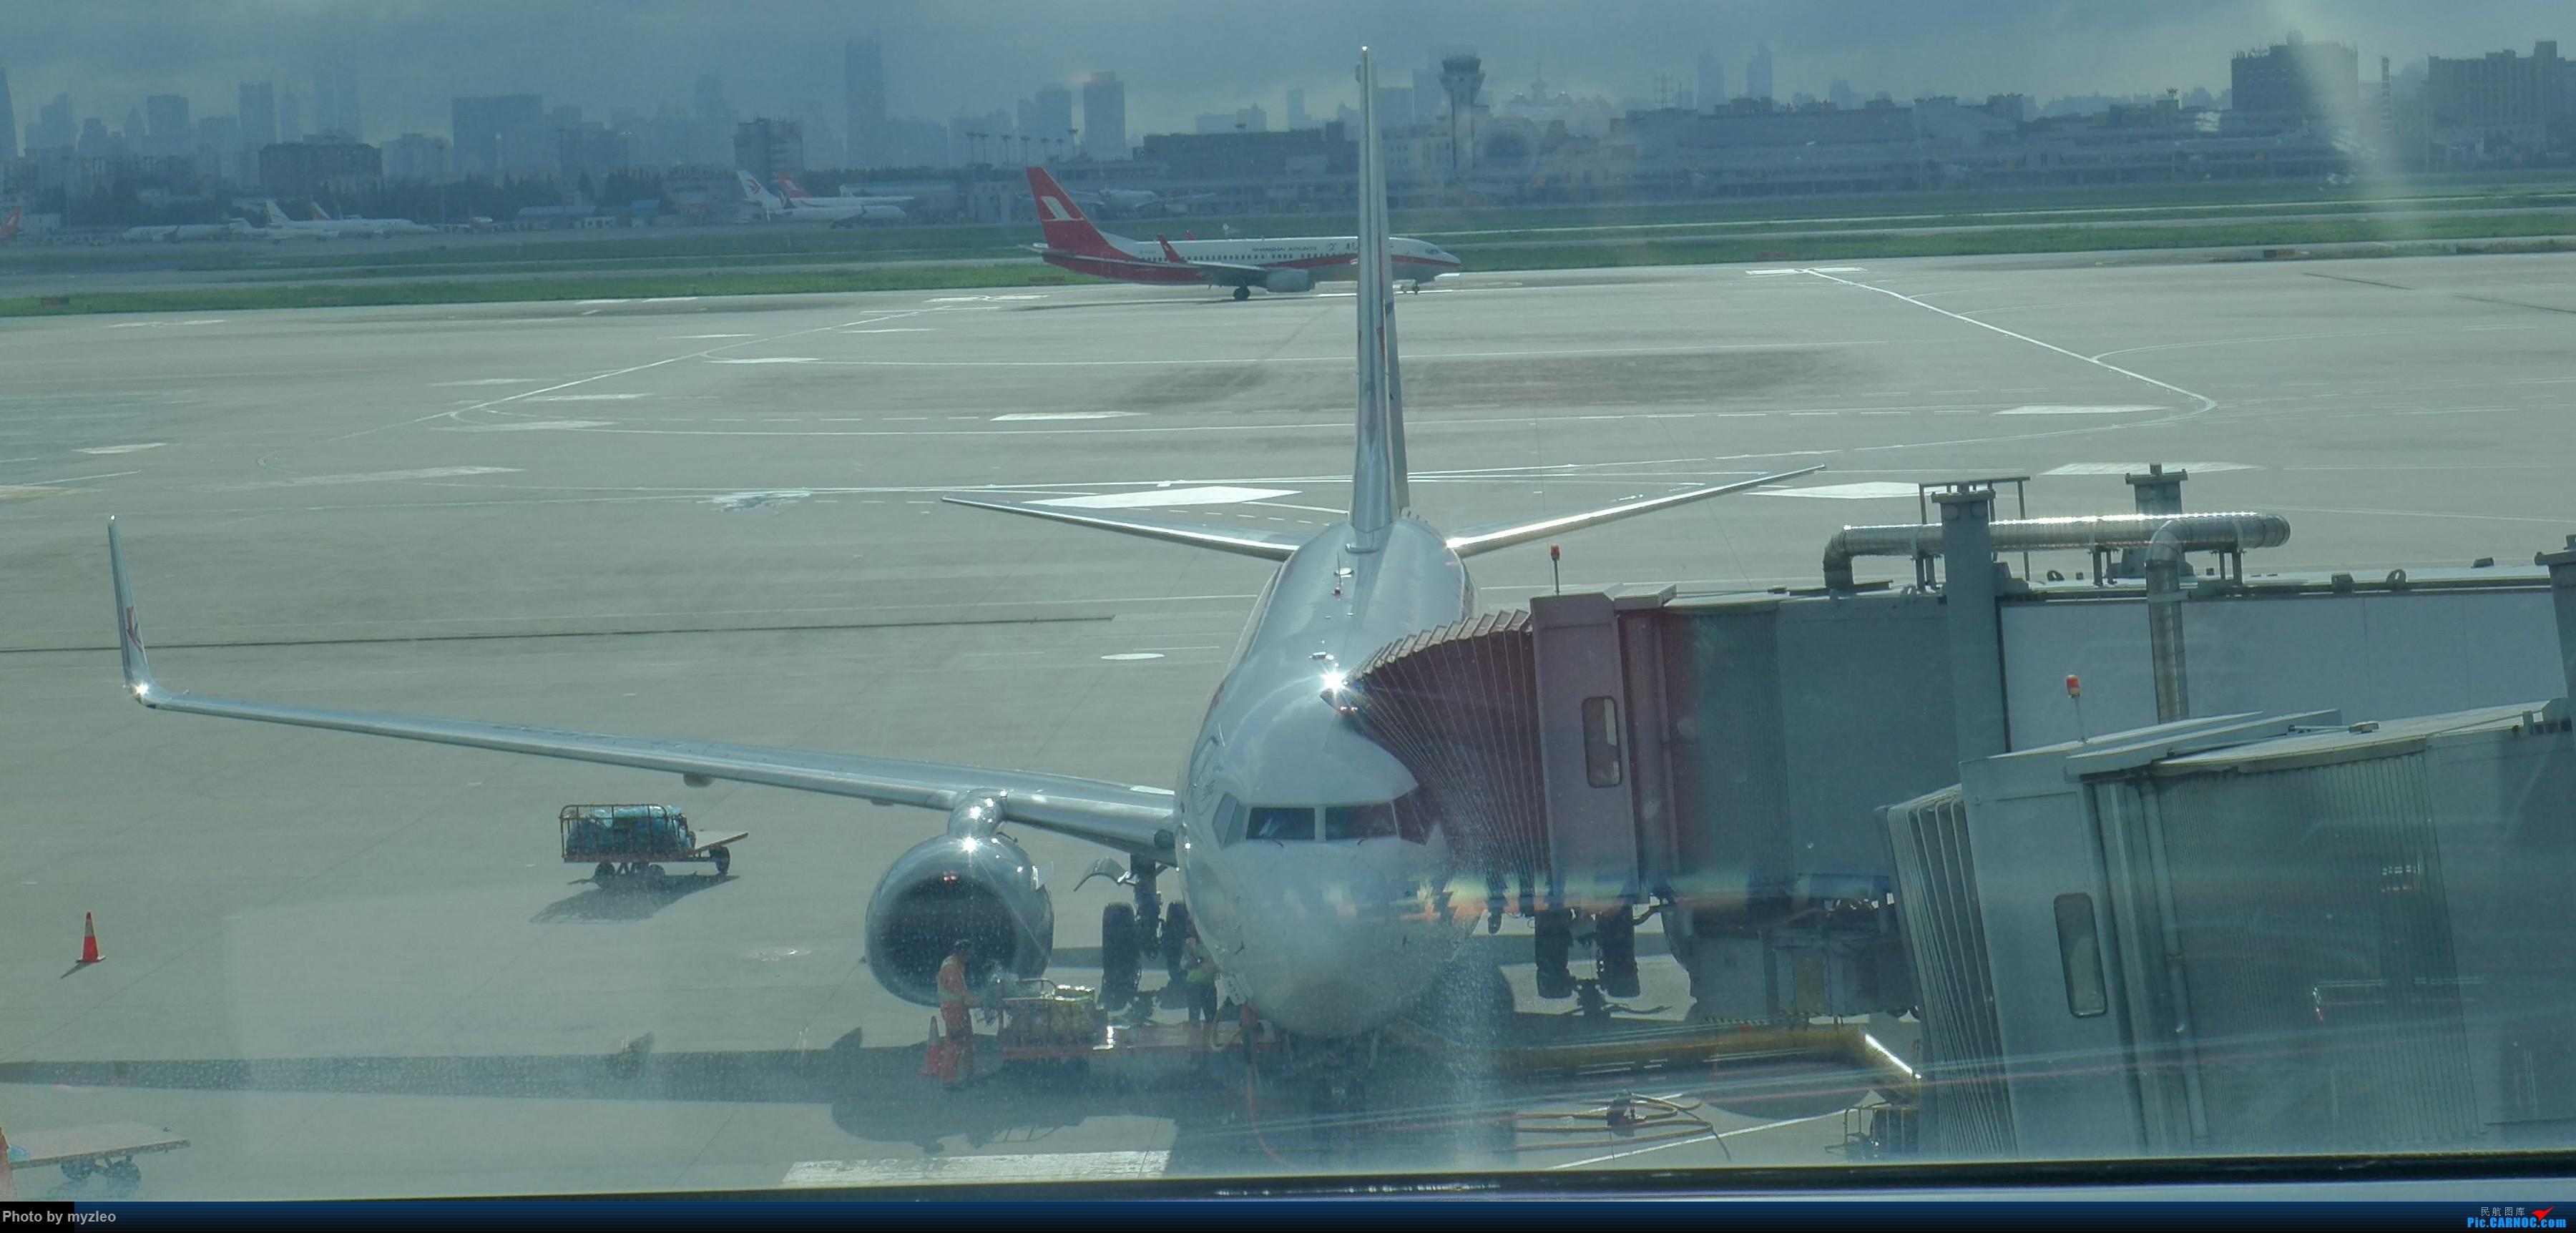 Re:[原创]【myzleo的游记3.1】三访帝都——记一次意外的惊喜,大鹅头初遇,第一次去中关村 BOEING 737-700 B-5820 中国上海虹桥国际机场